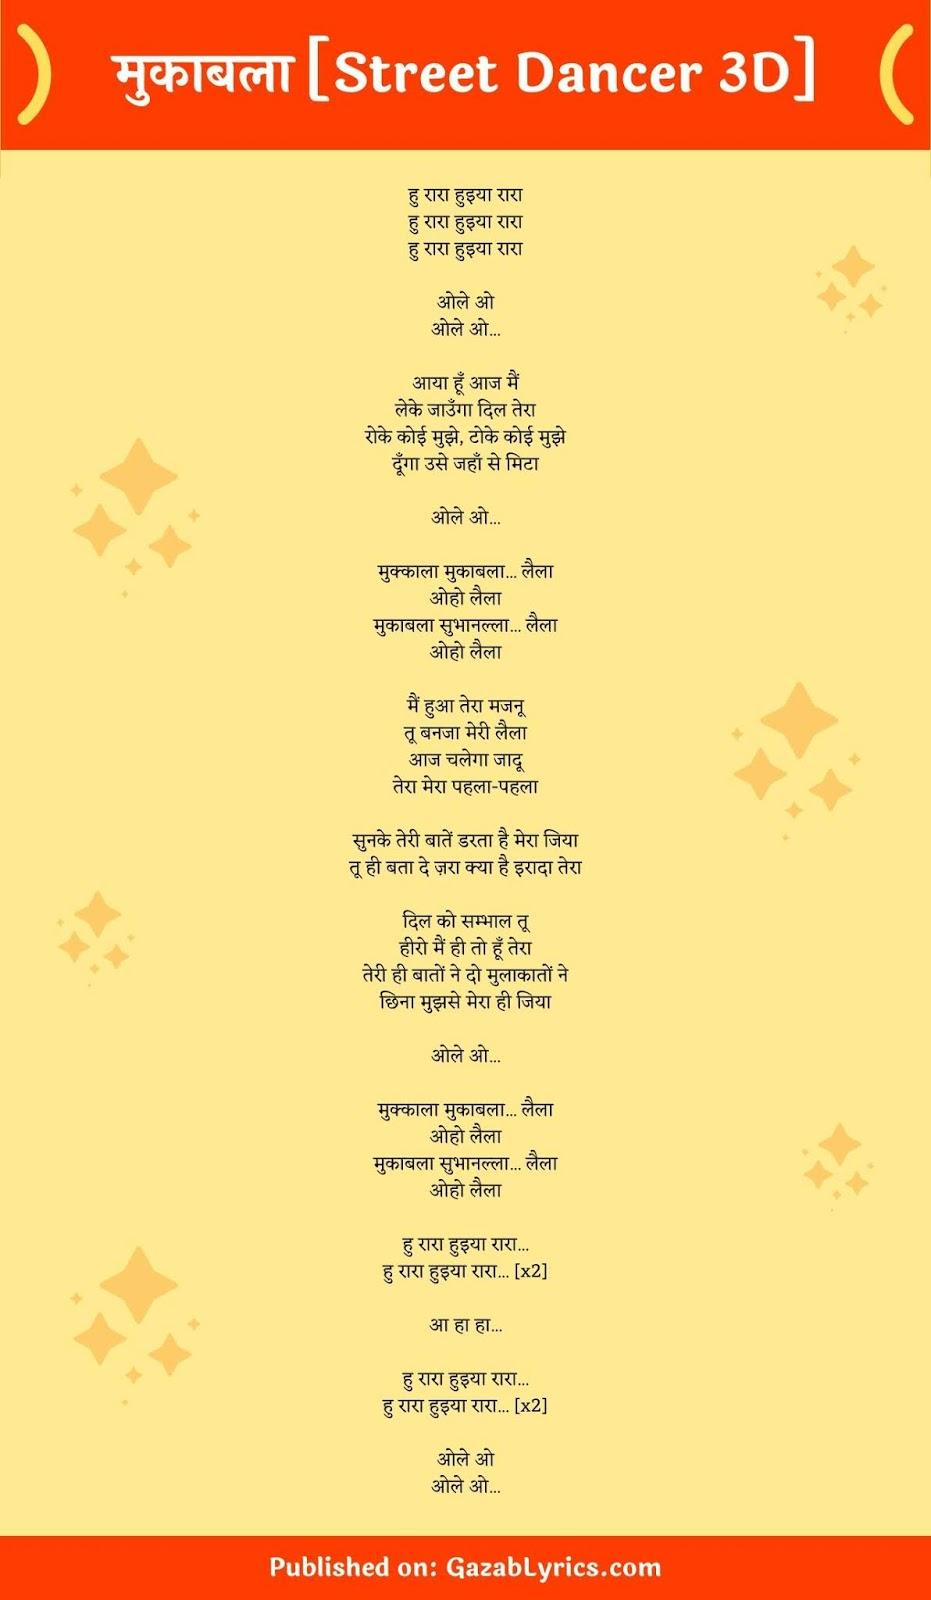 Muqabla track song lyrics image